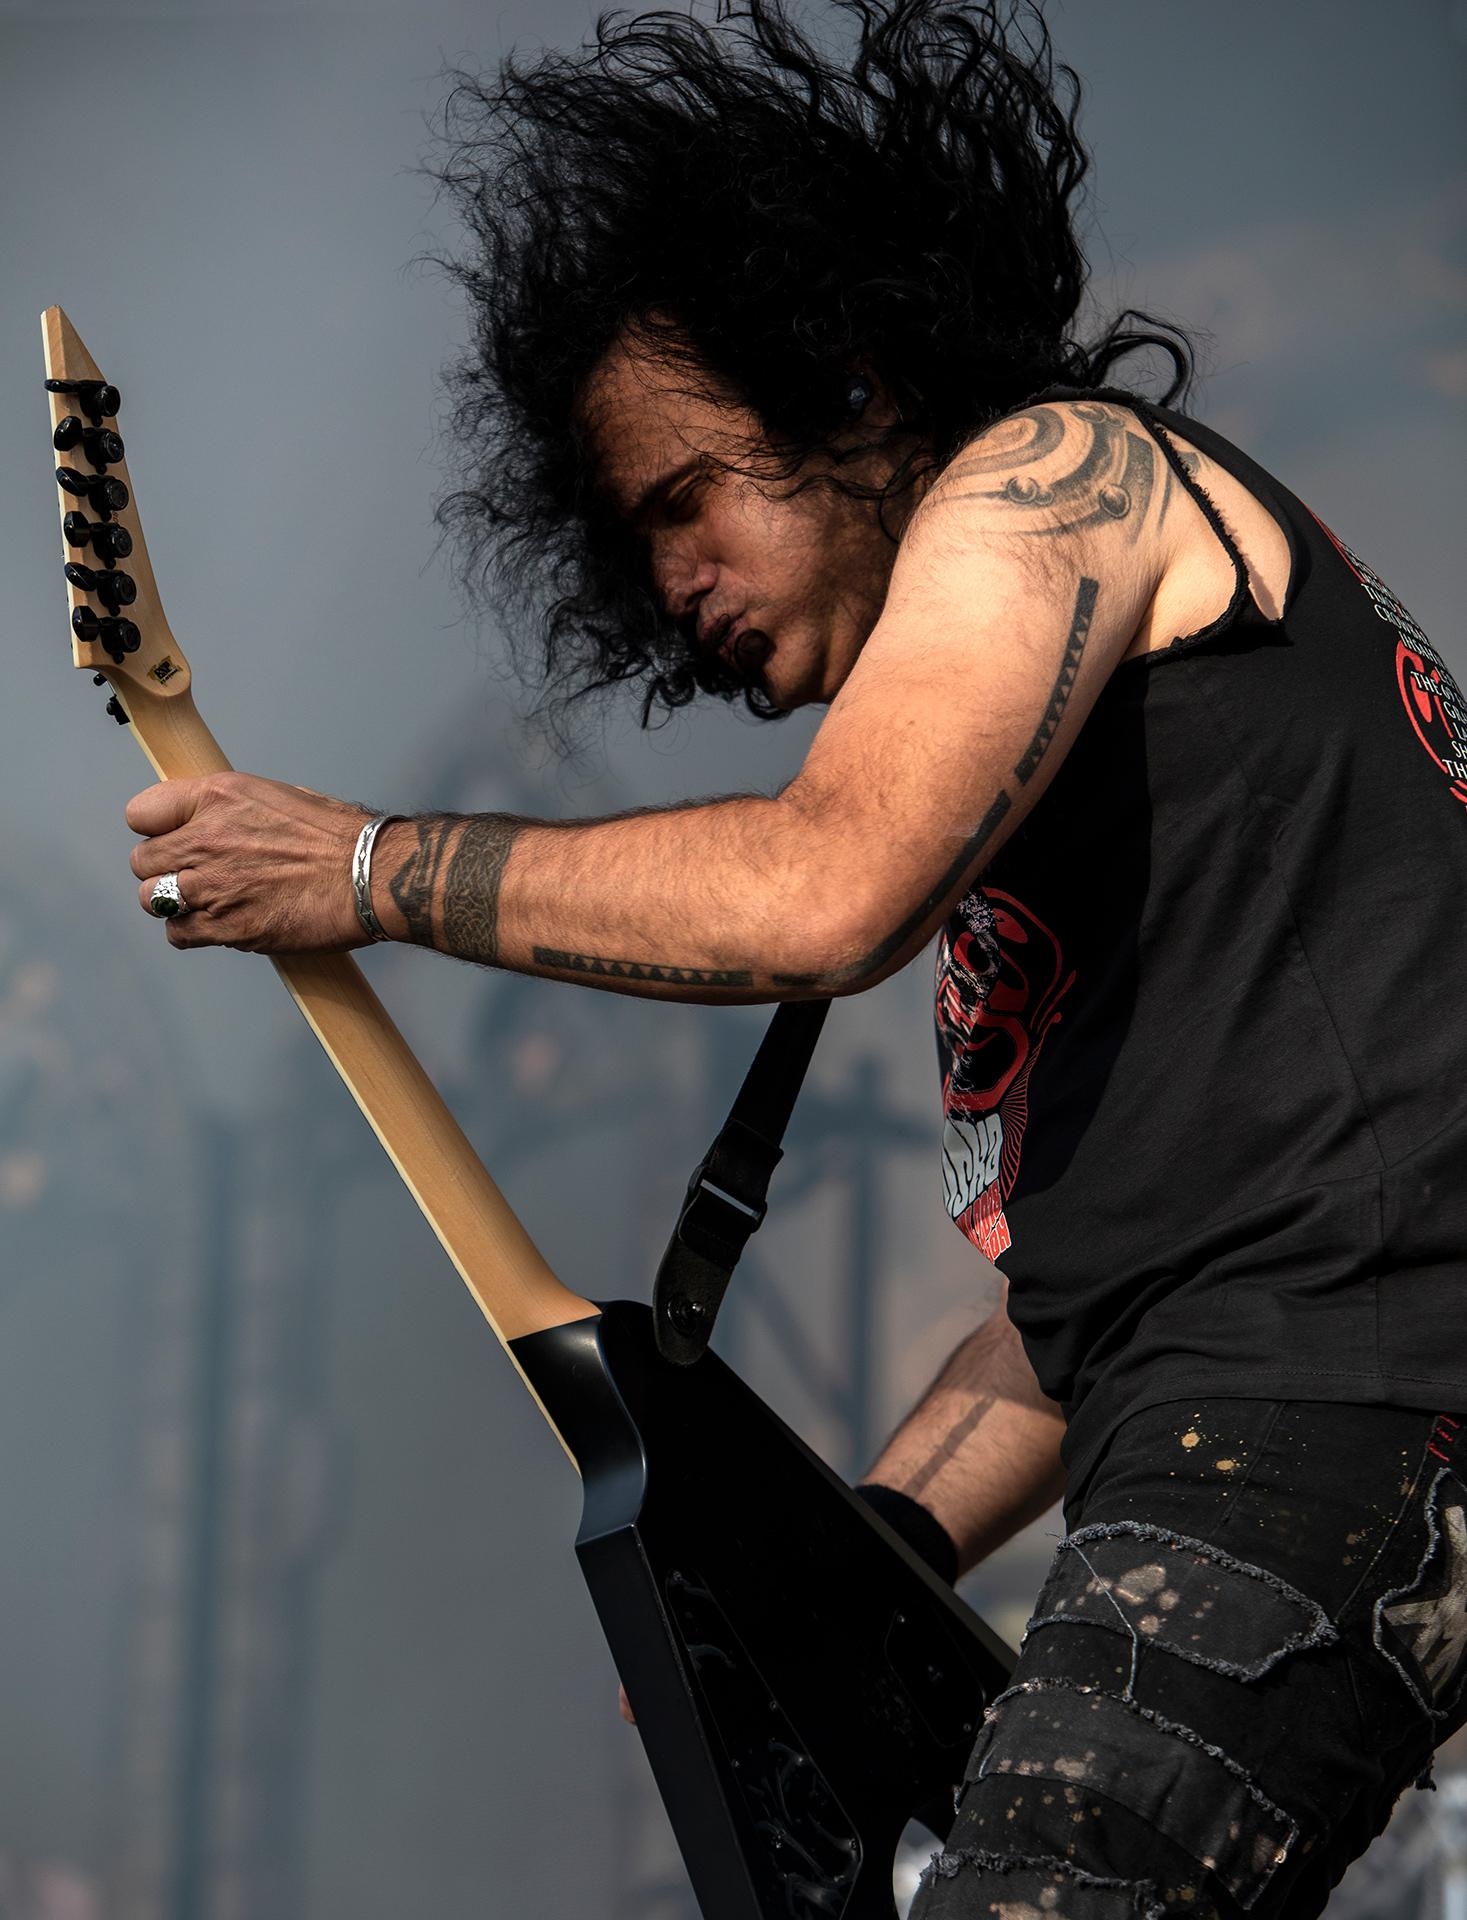 Mille Petrozza, Kreator, Tuska metal festival, metal music